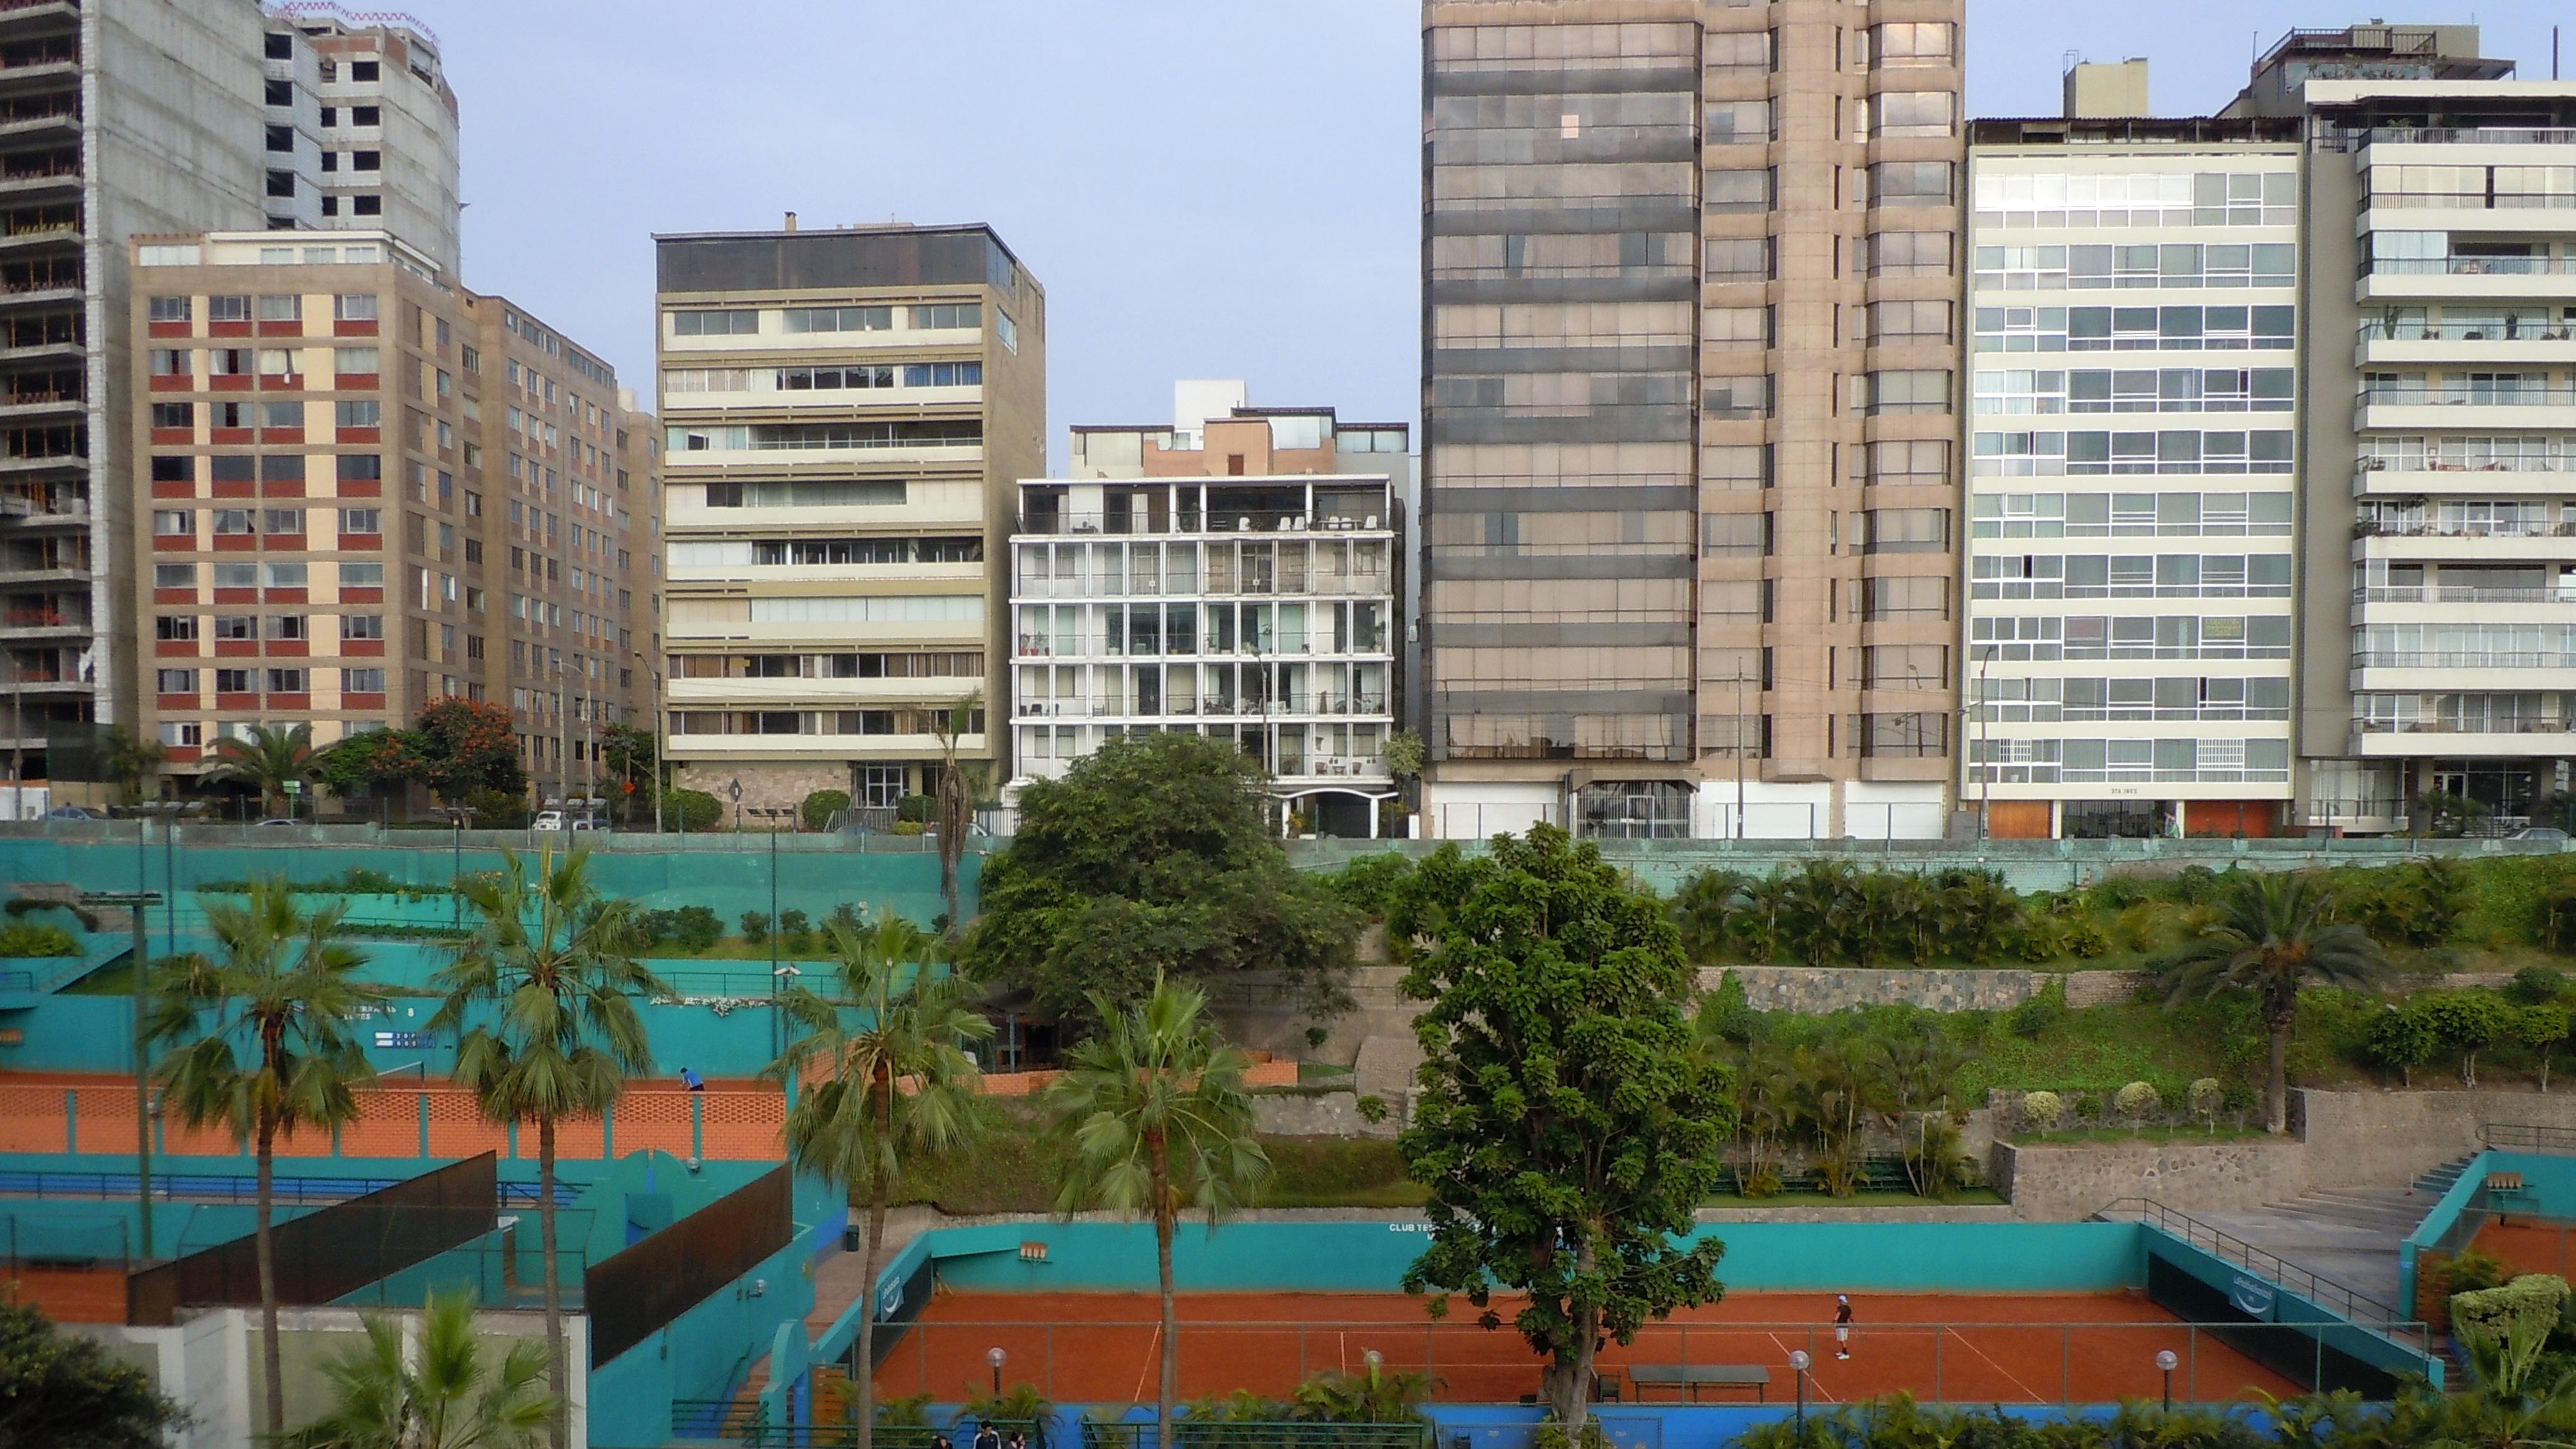 http://fenvar.lima-city.de/StarTrek/RomKling1.png www.bet365 bet365-support-chat poker bet365 quoten verstehen